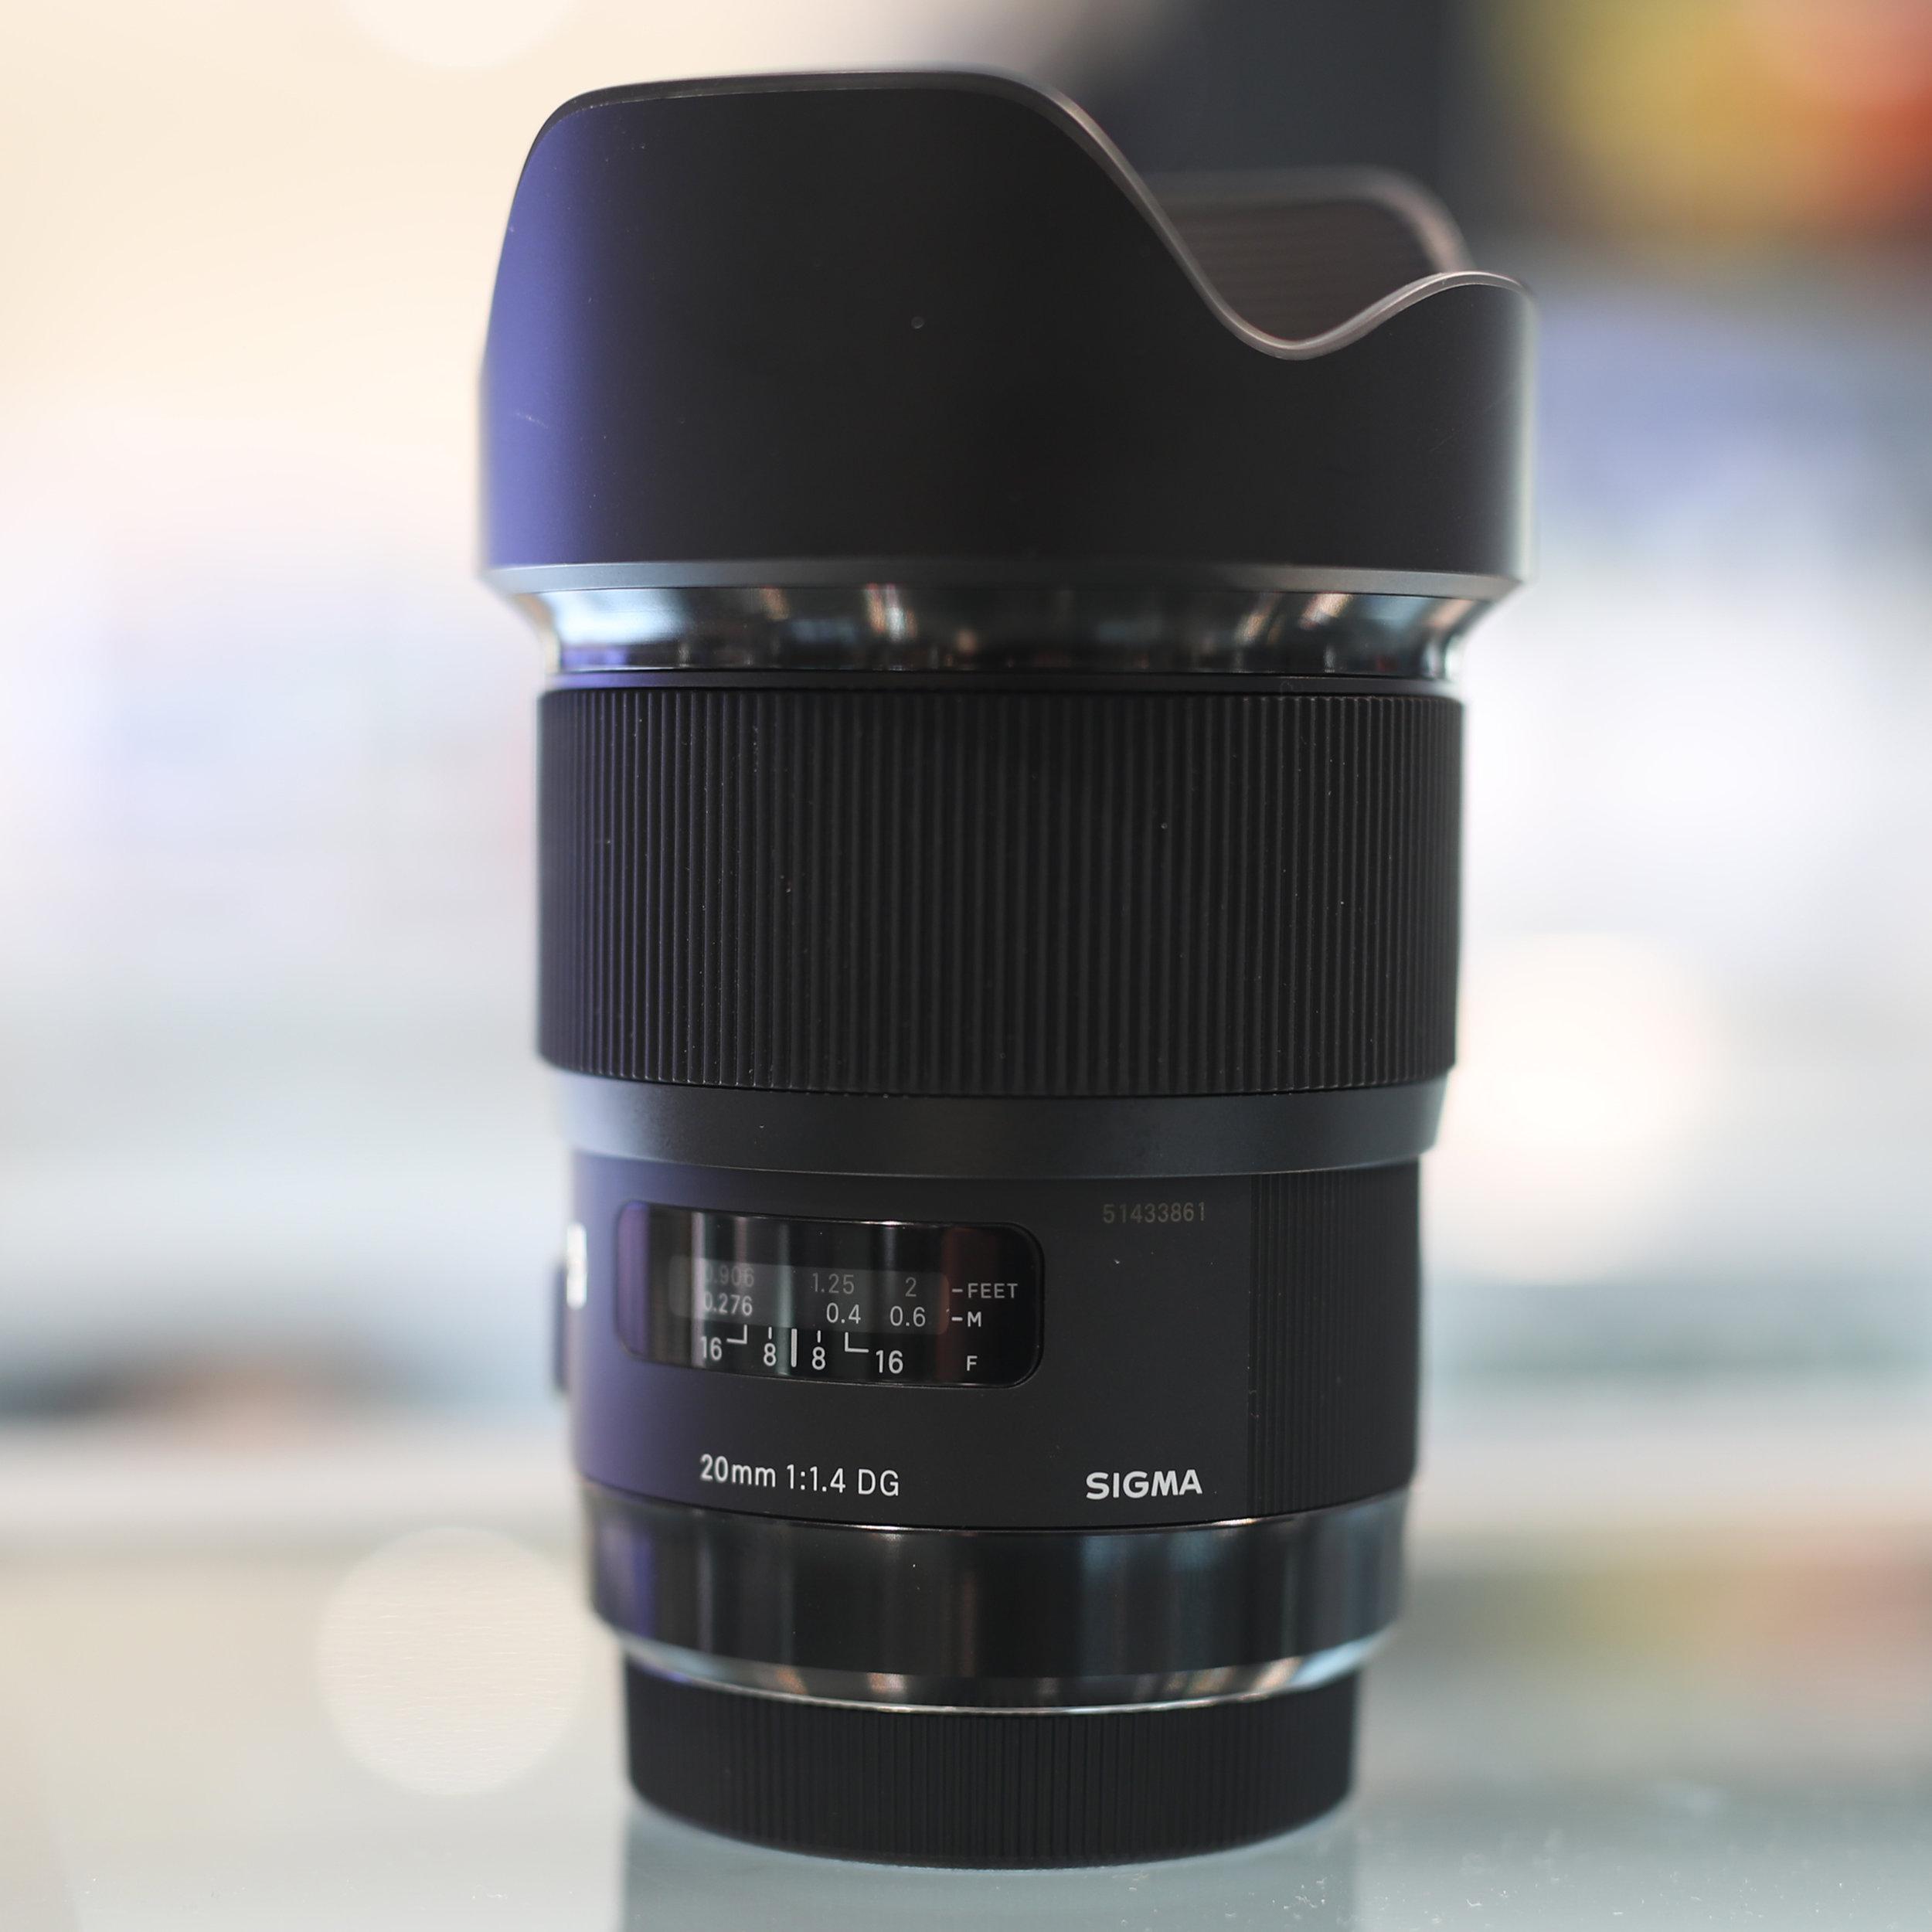 Sigma 20mm f1.4 DG lens ANT_0266 sq.jpg